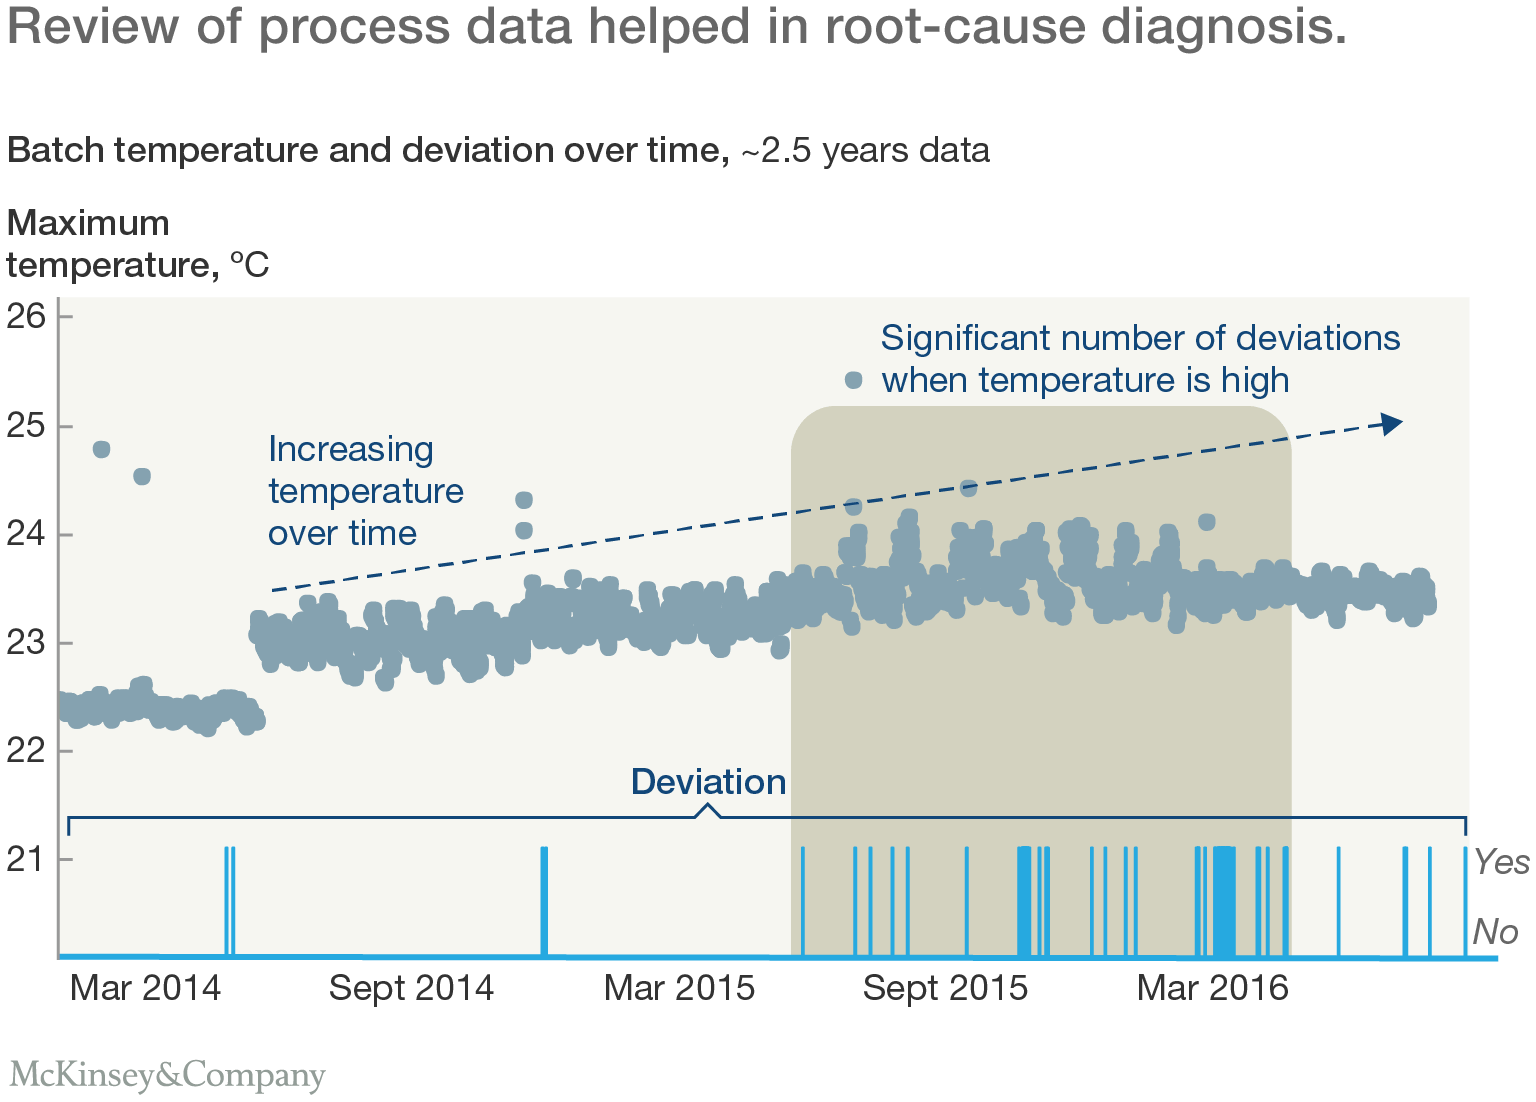 Toward zero defects: Using analytics to reshape quality | McKinsey